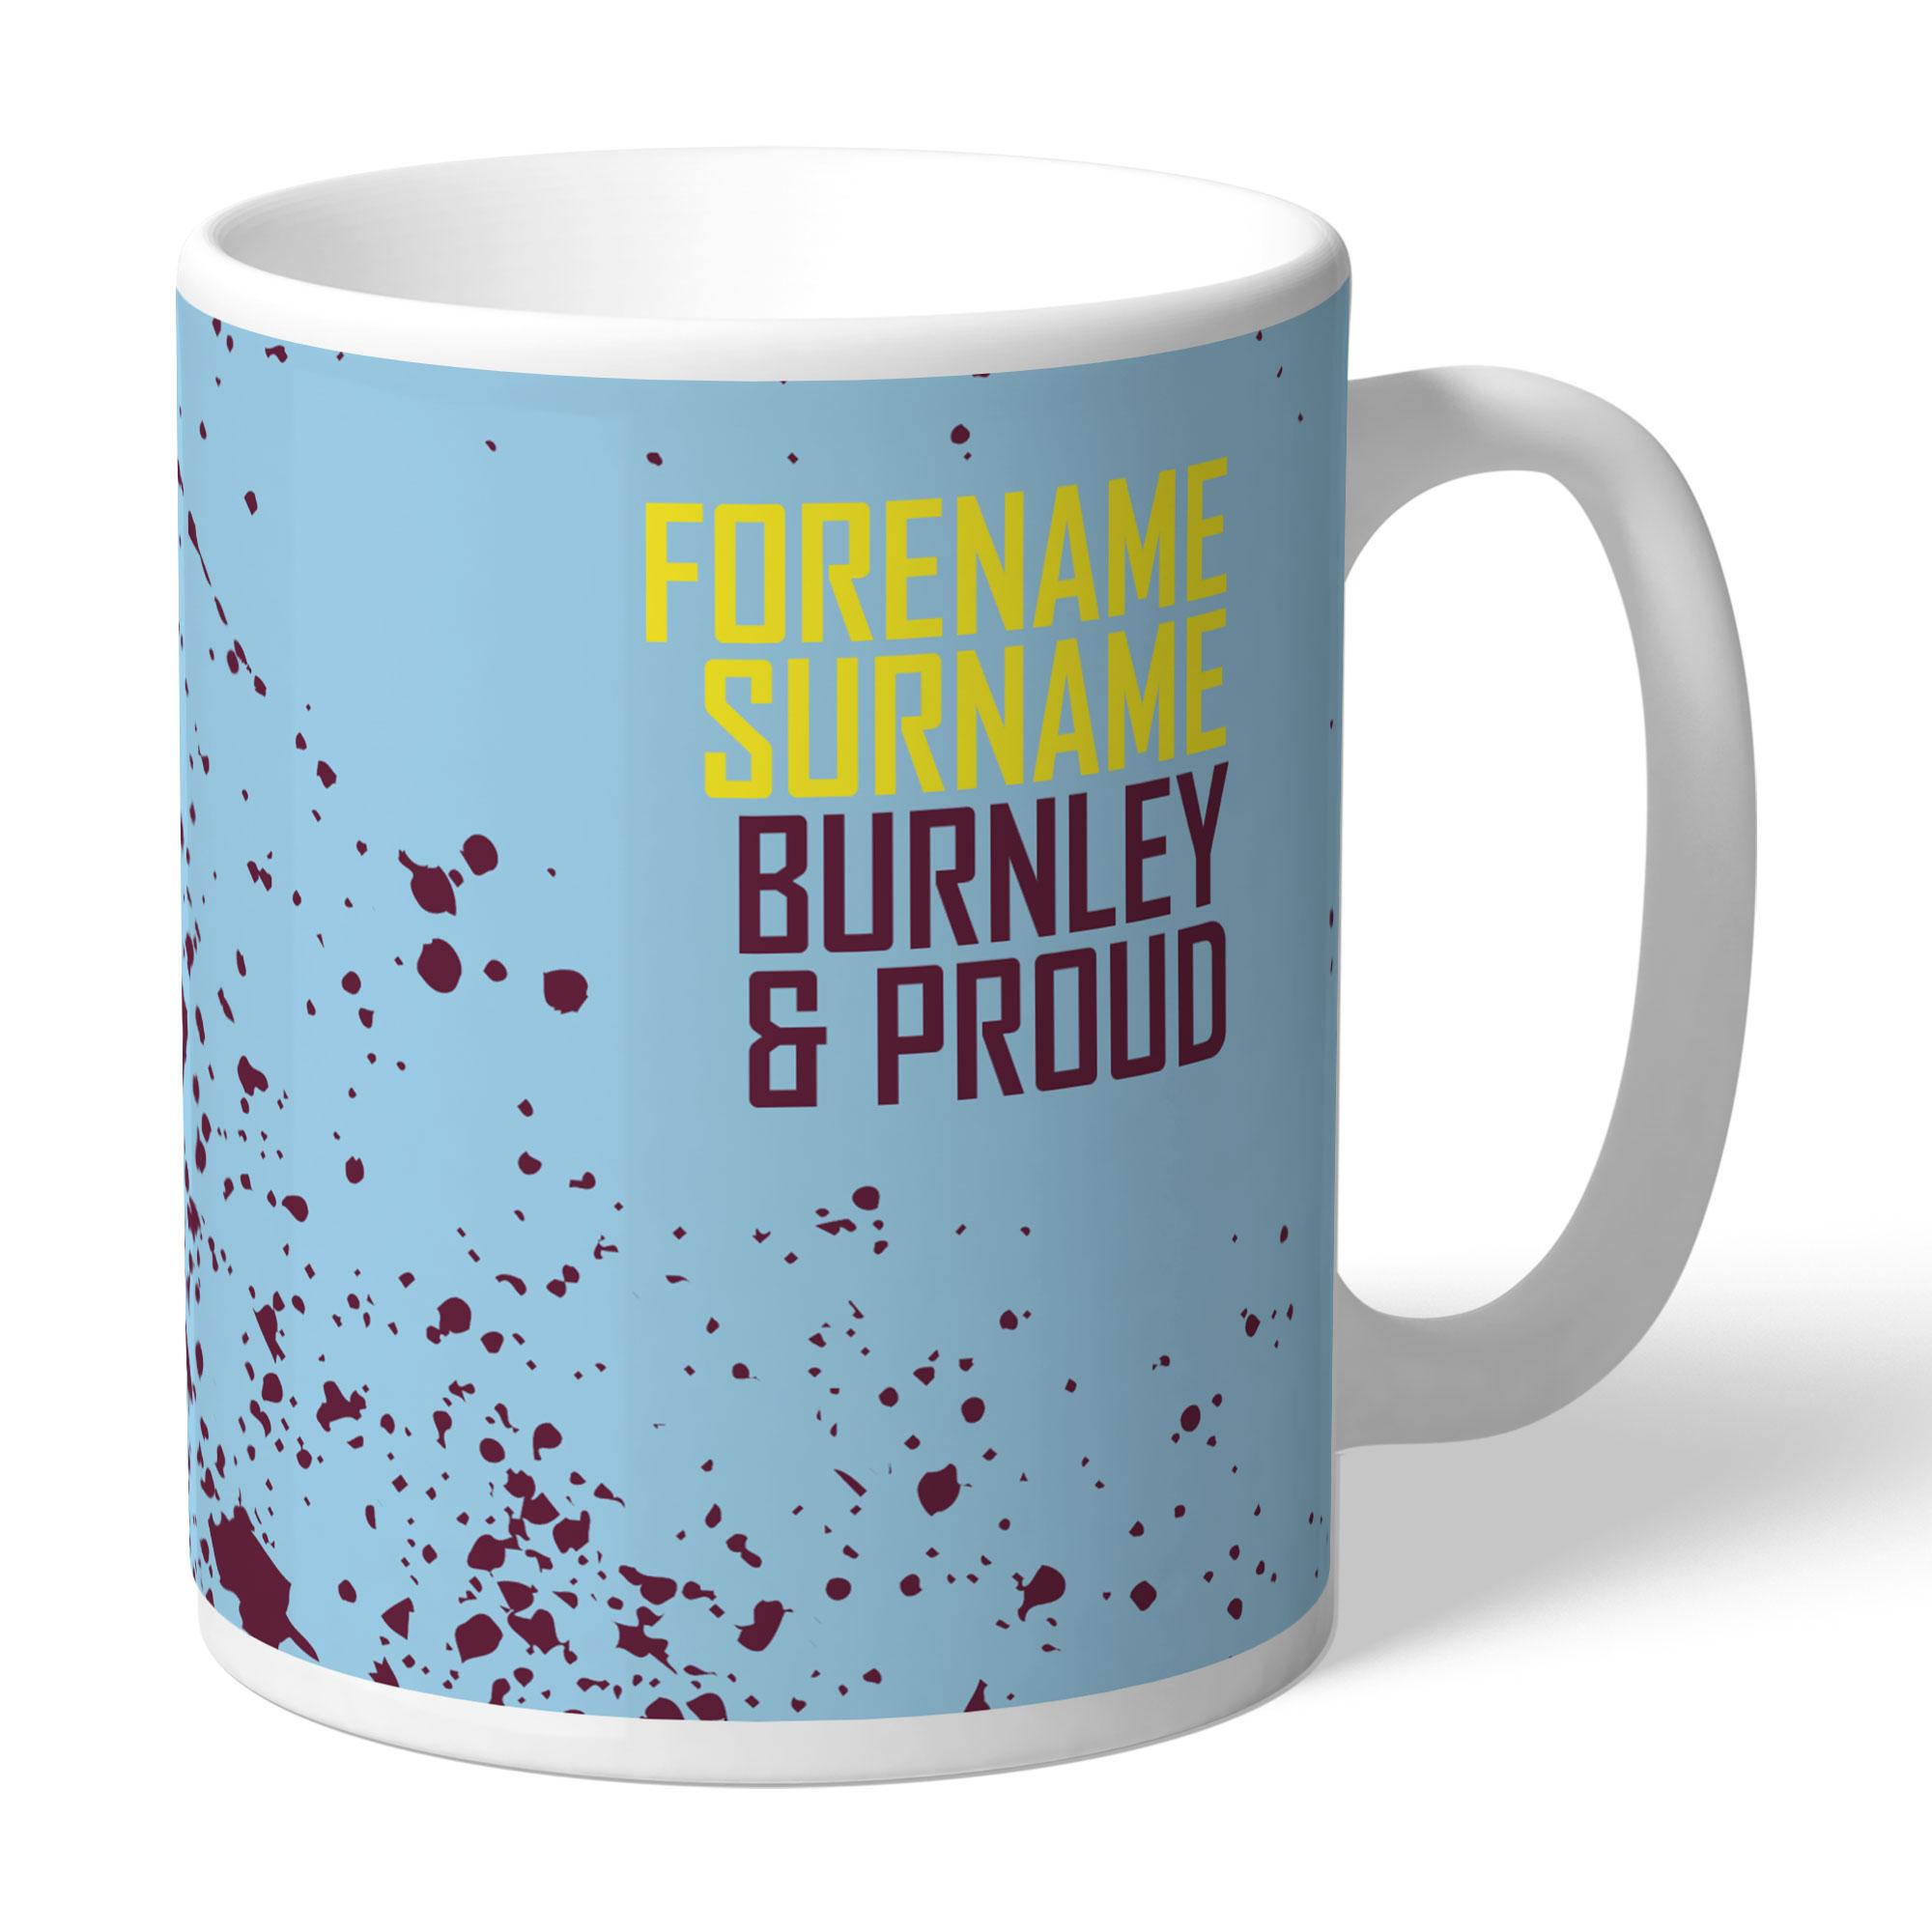 Burnley FC Proud Mug